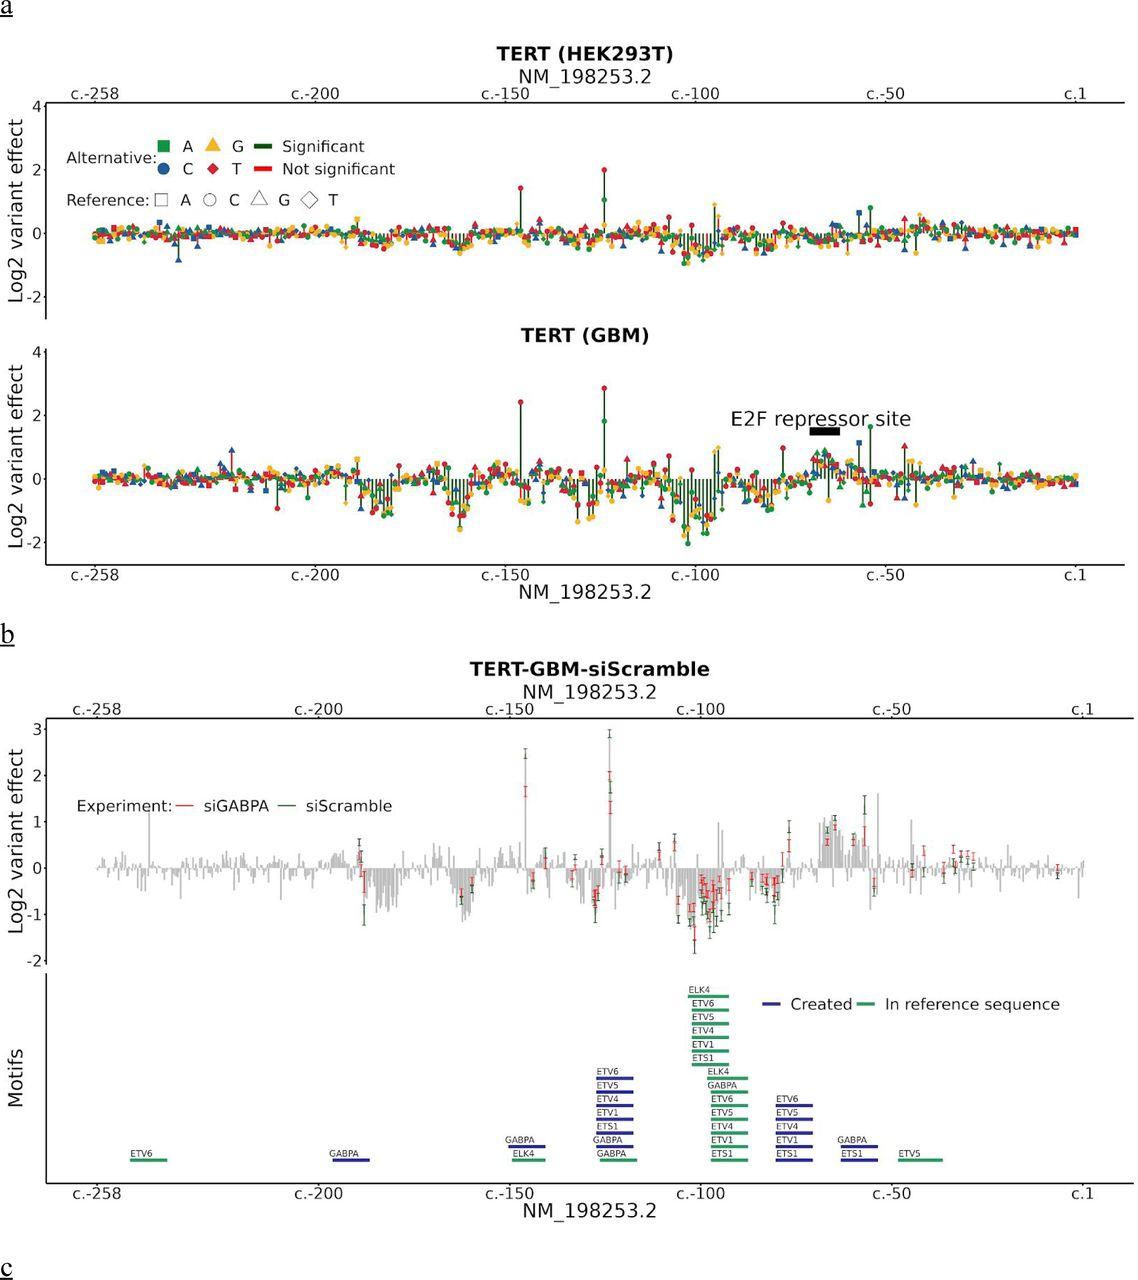 Saturation mutagenesis of disease-associated regulatory